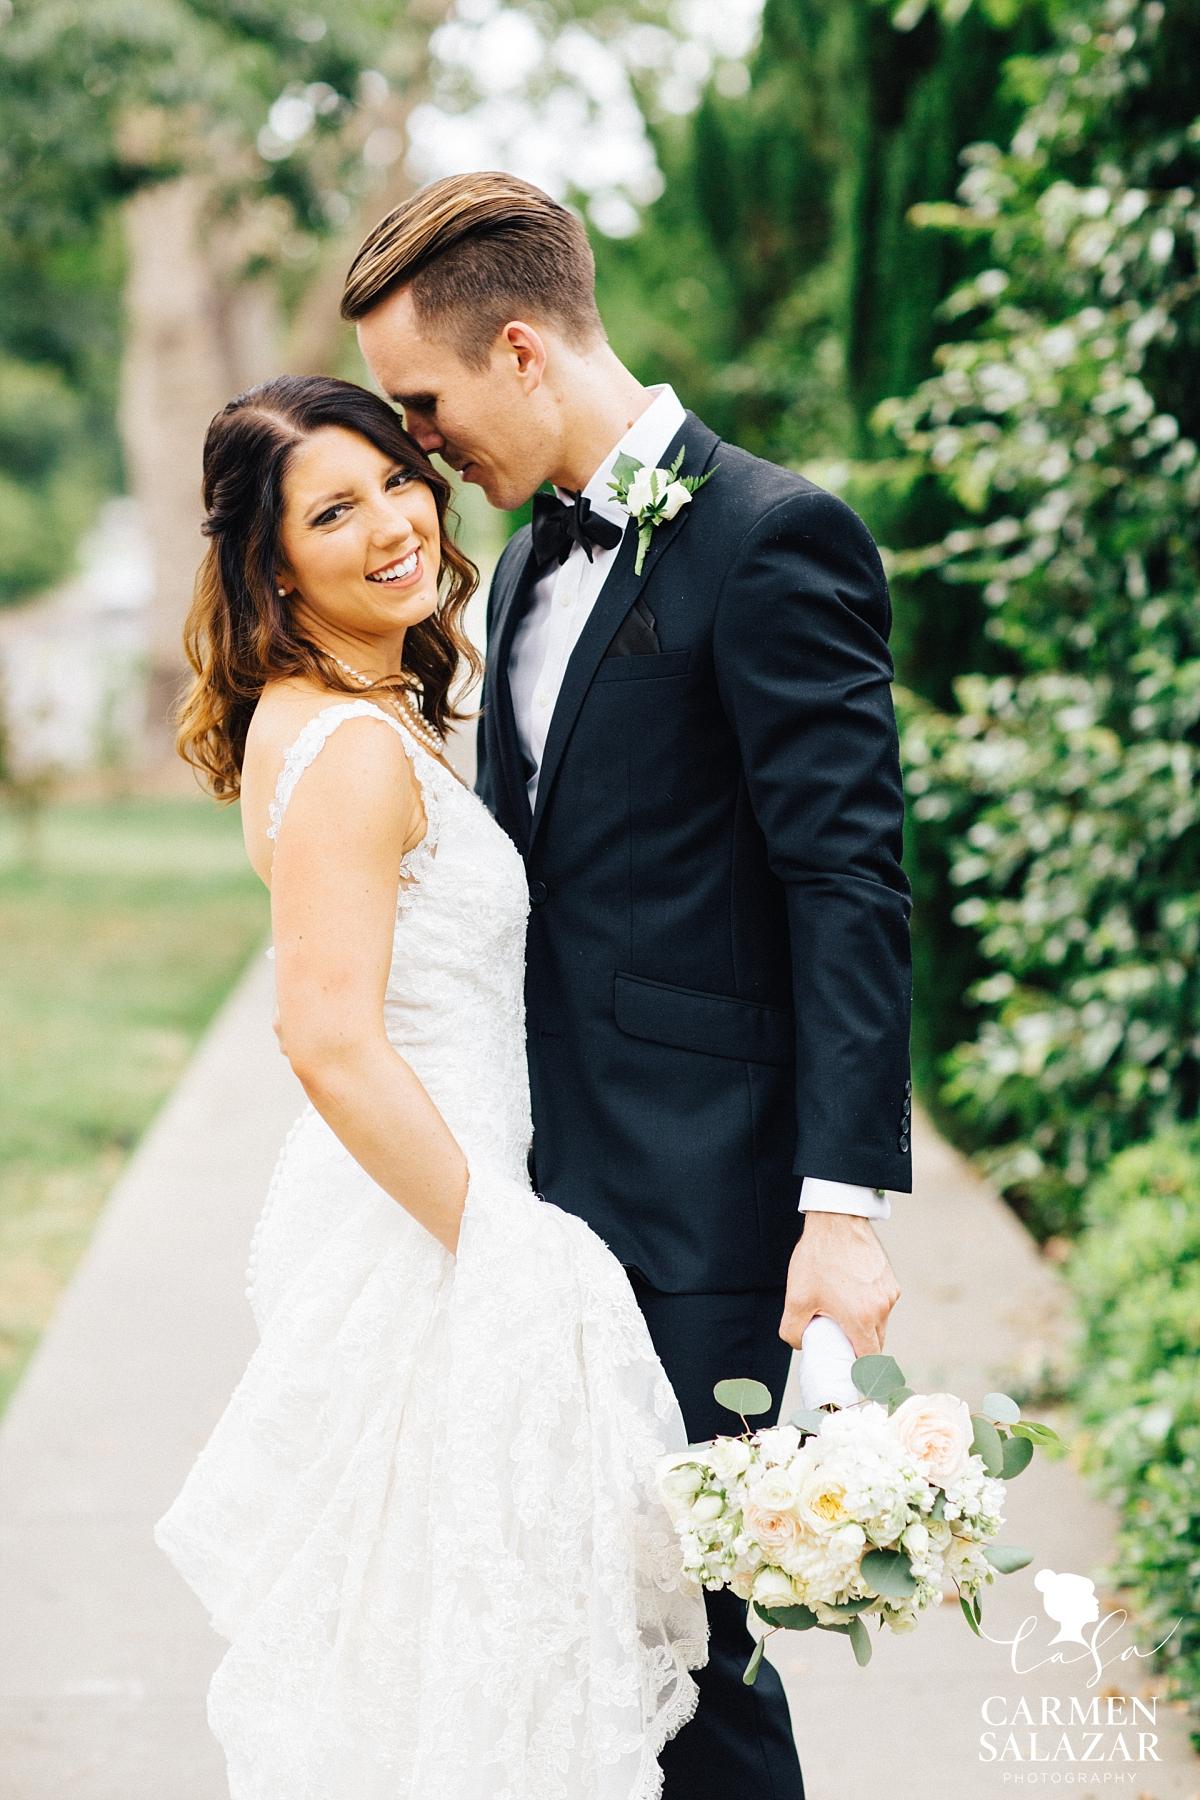 Midtown Sacramento wedding portraits - Carmen Salazar